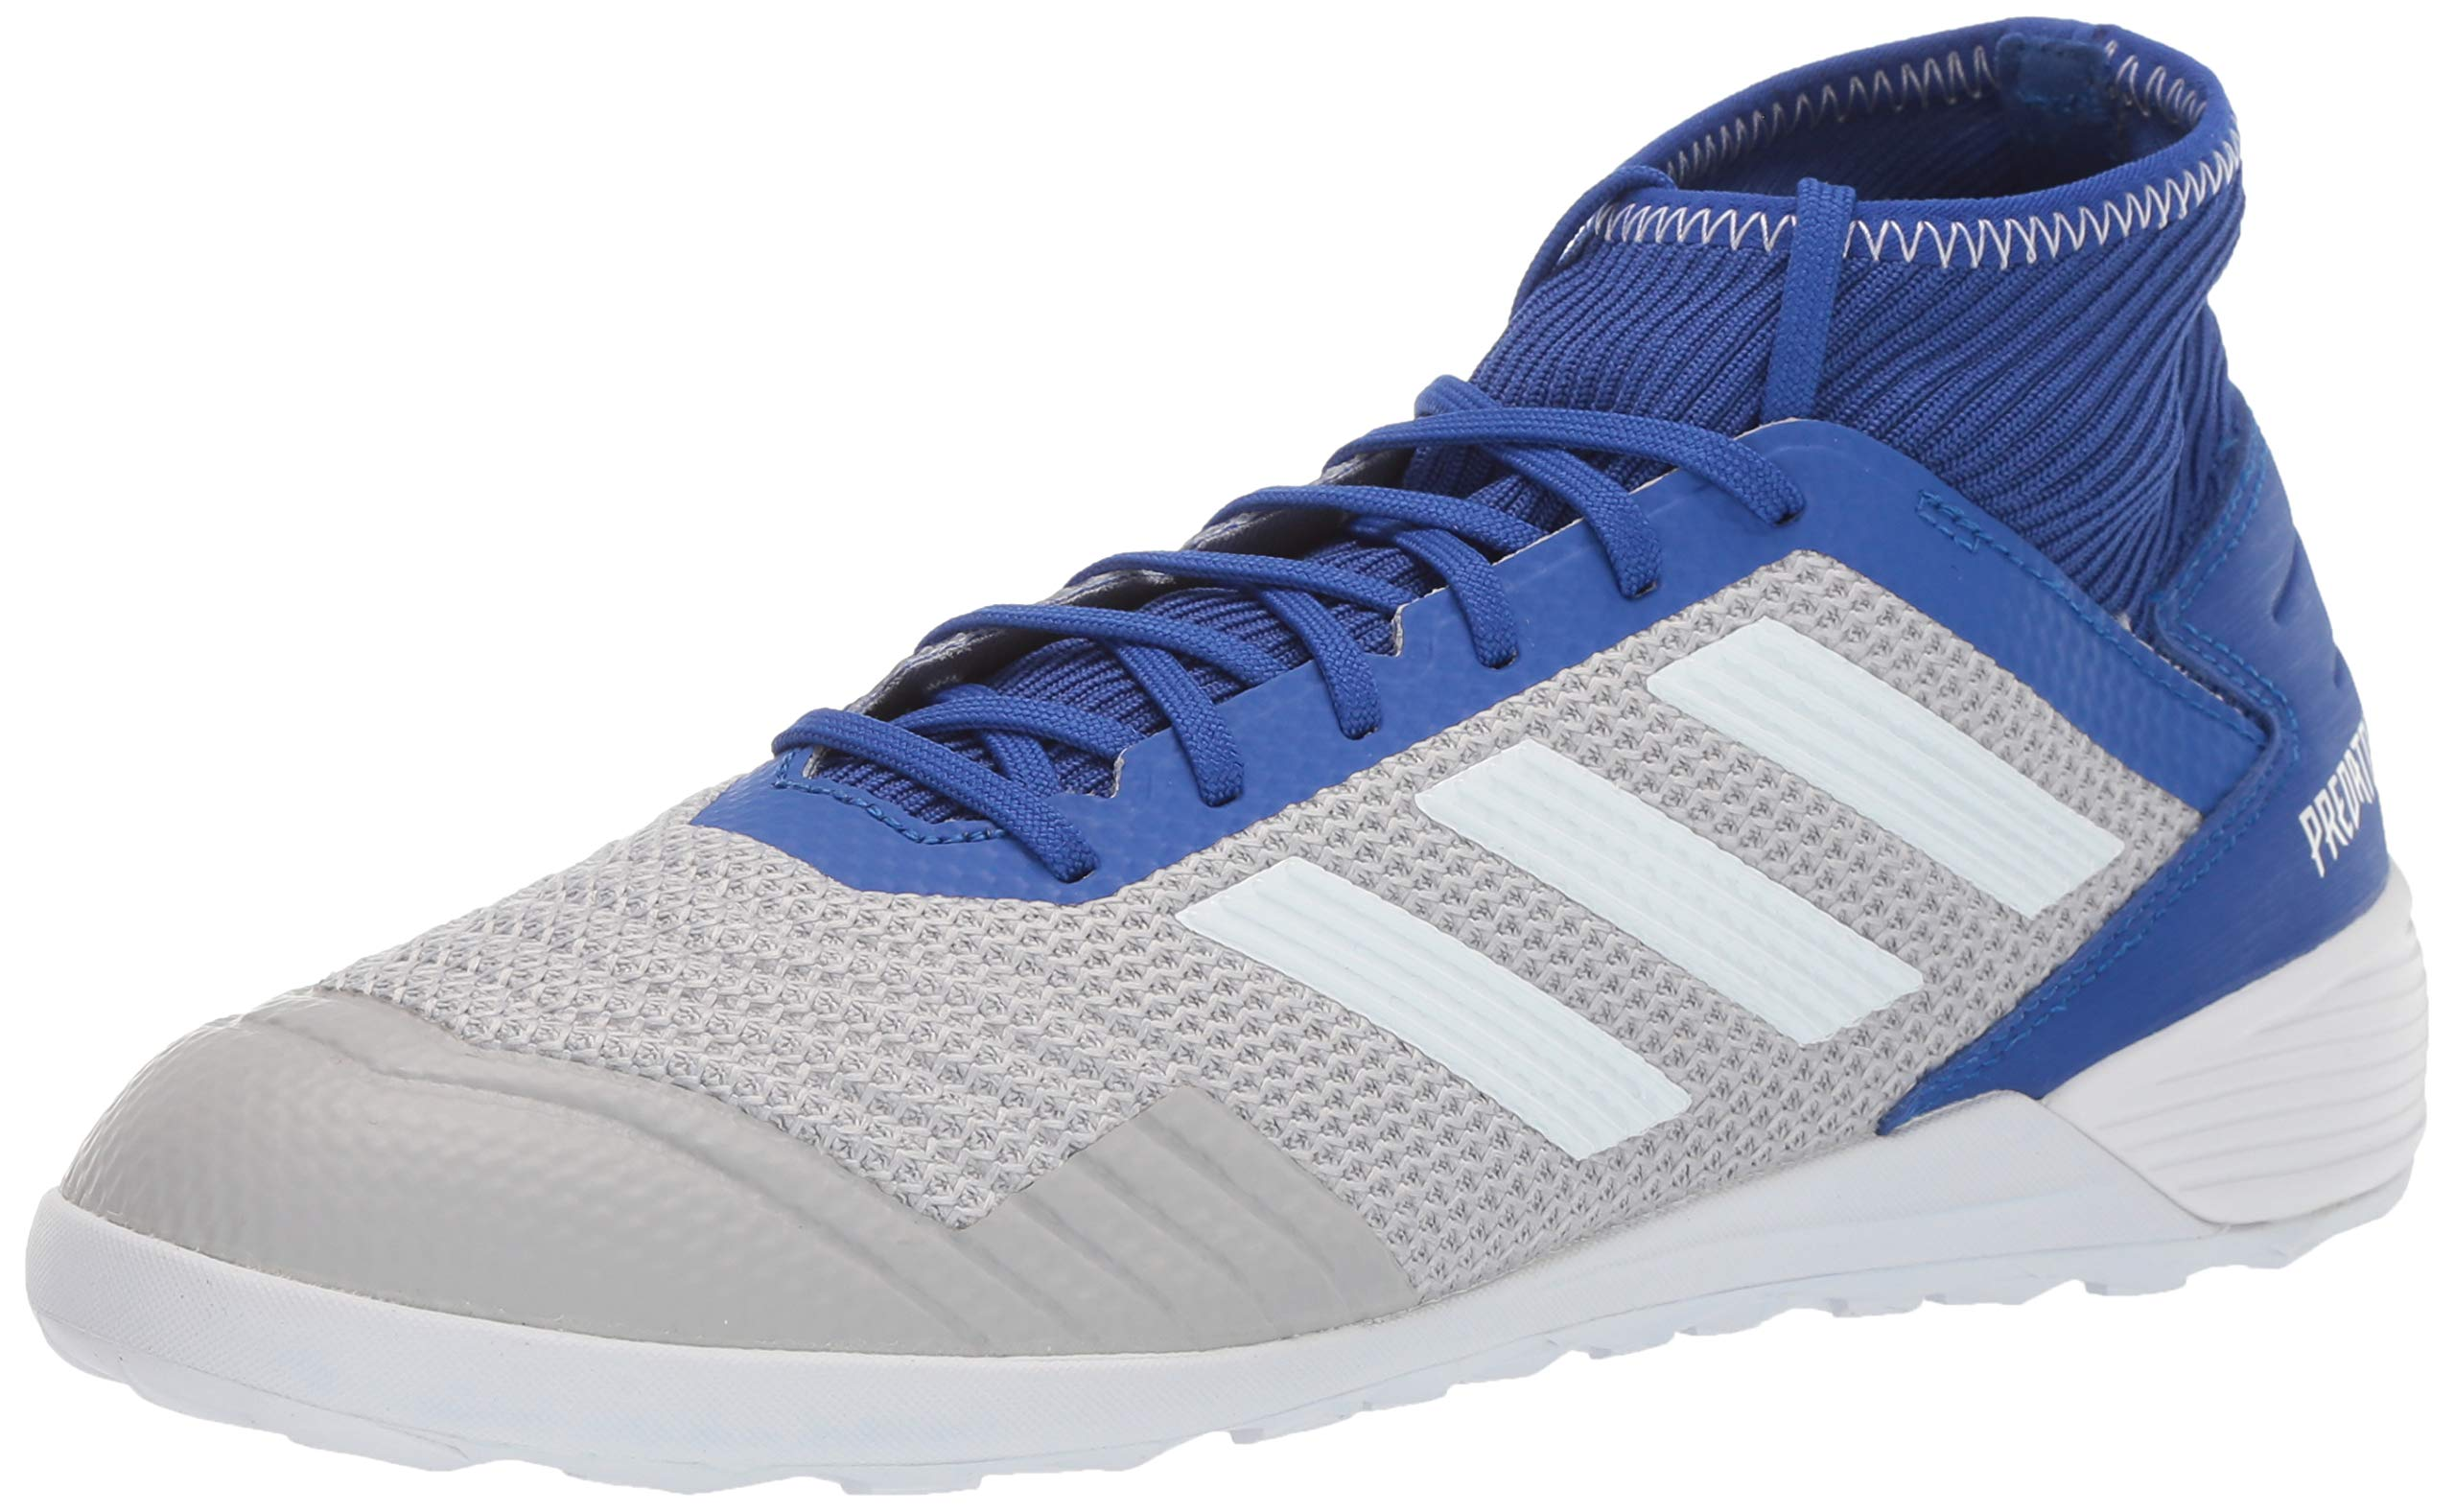 adidas Men's Predator 19.3 Indoor Soccer Shoe Grey/White/Bold Blue 6.5 M US